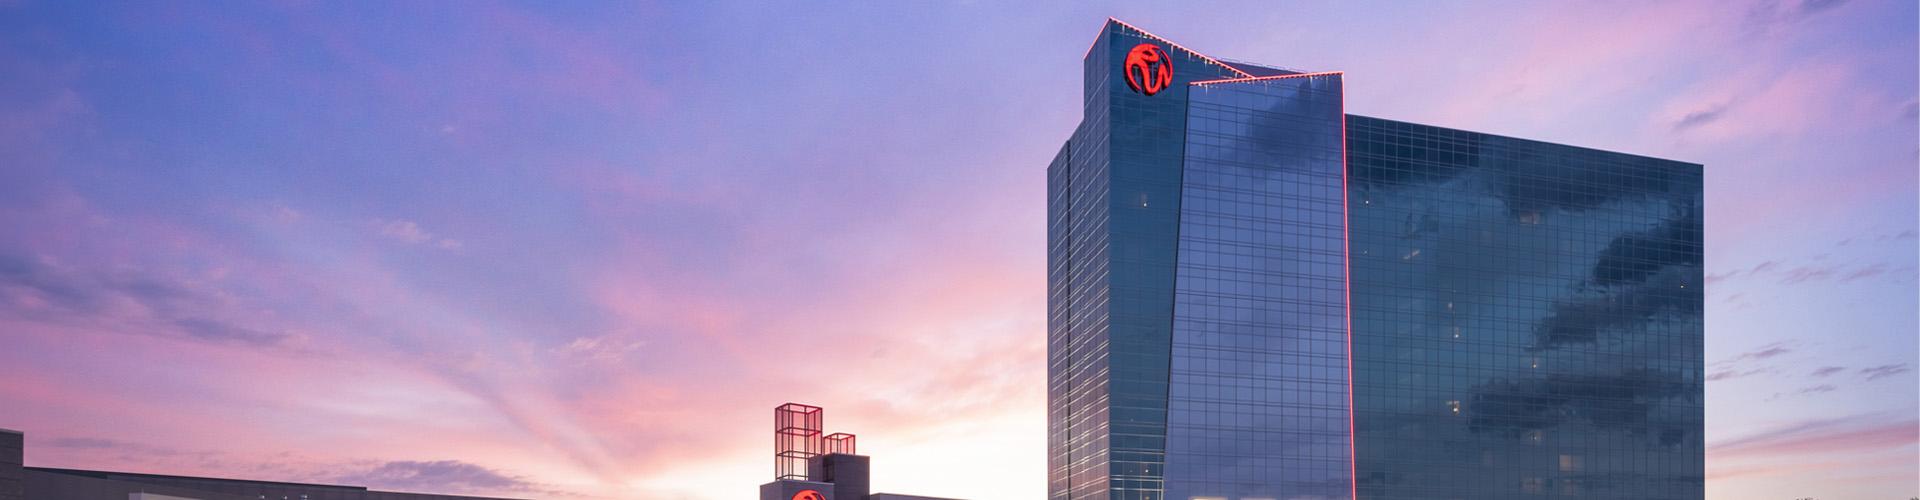 Resorts World Catskills Building